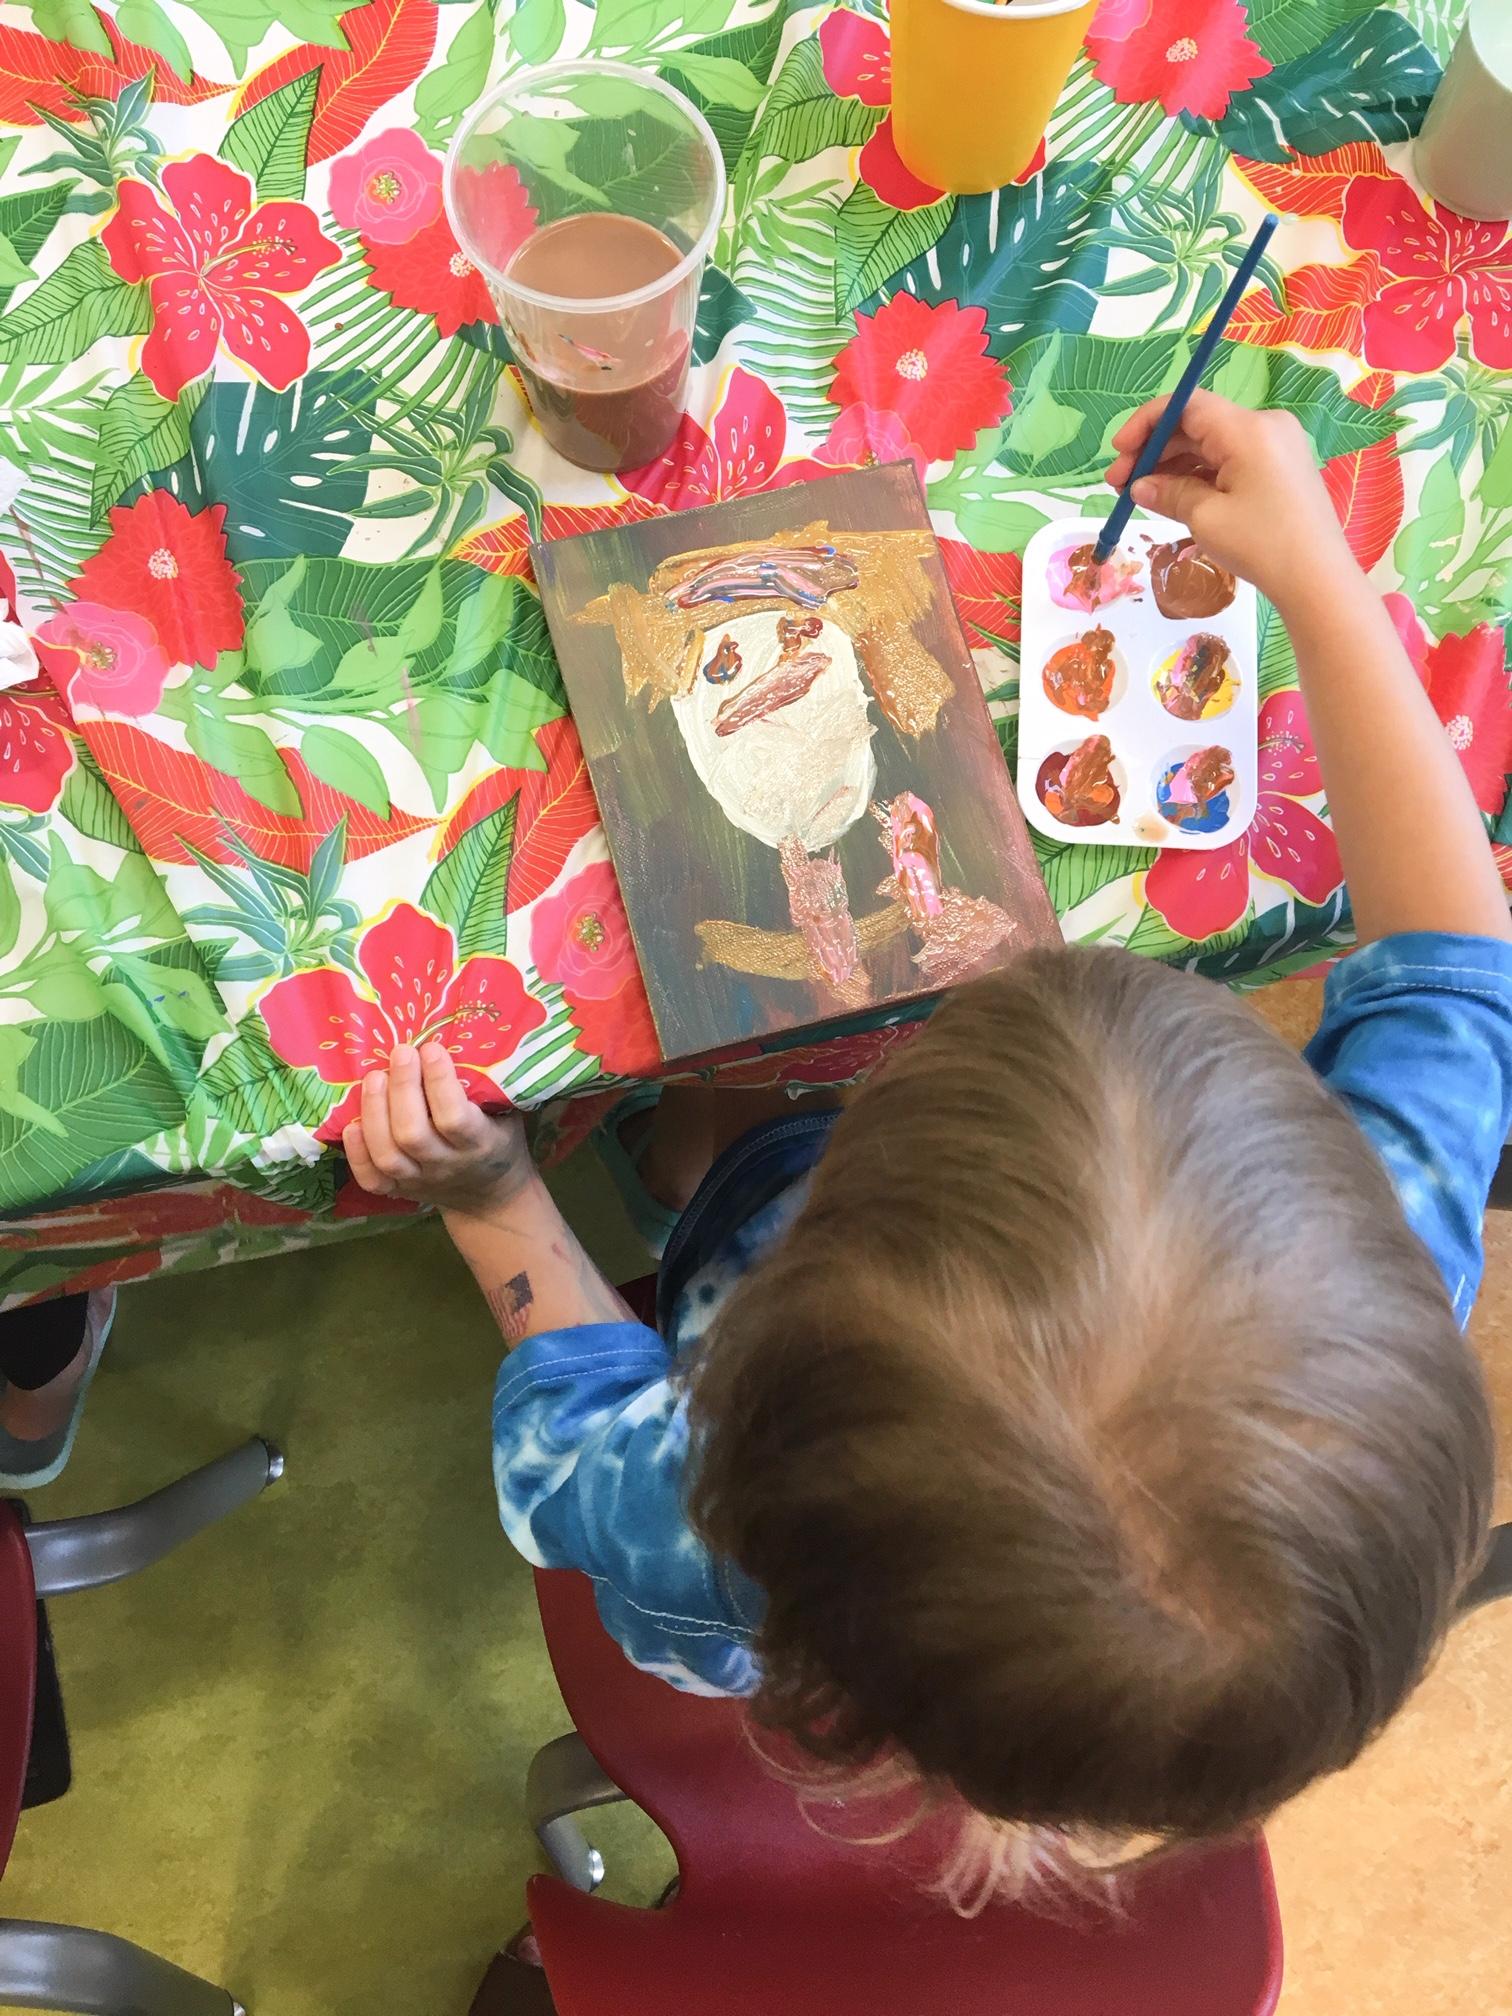 Paint a Selfie with Frida Kahlo #fridakahlo #kidsart #kidscraft #library #childrenslibrary